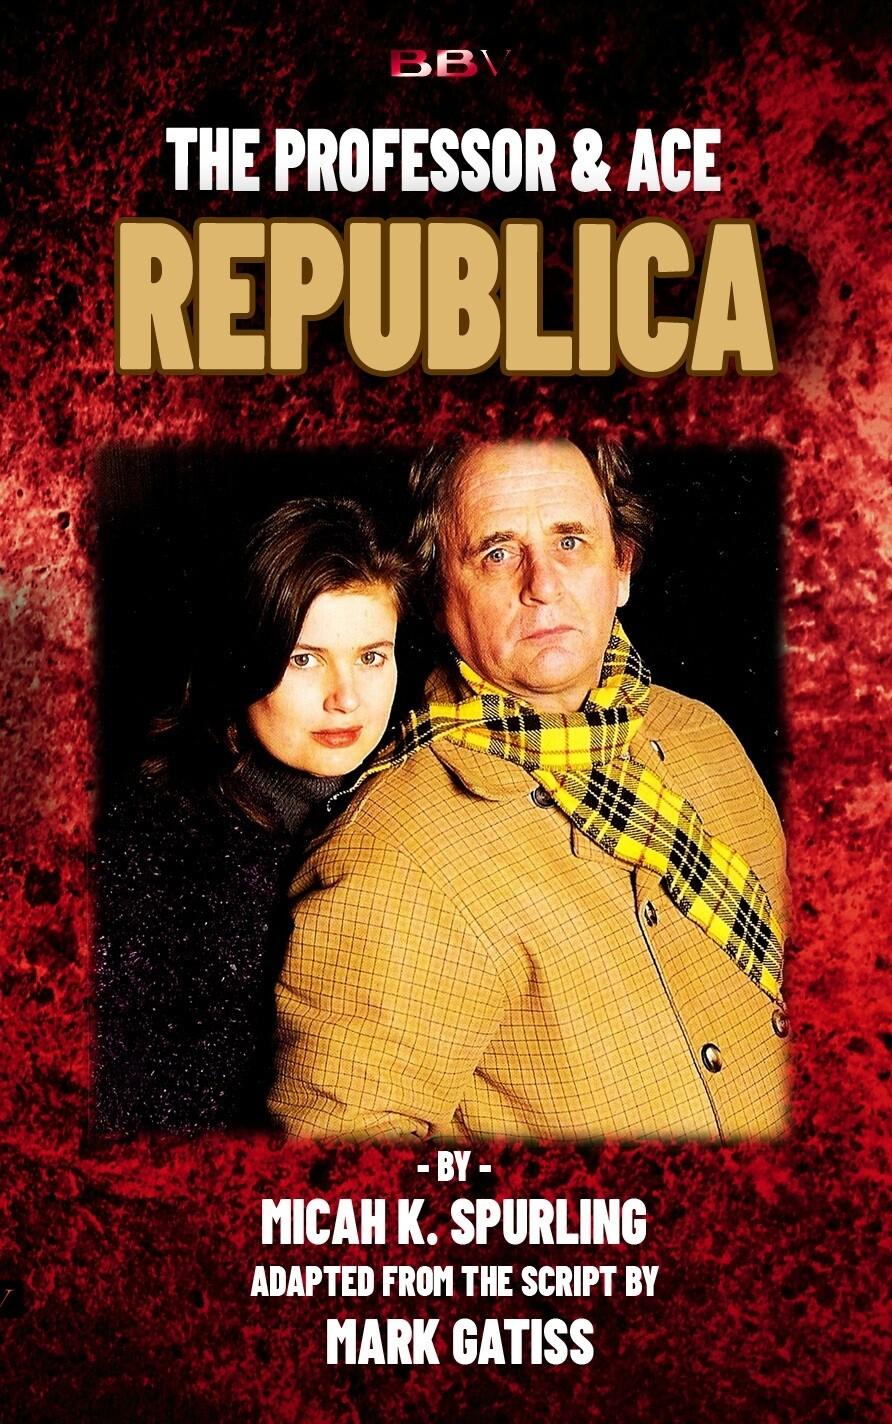 Republica Novelisation (A5 SIZE BOOK)